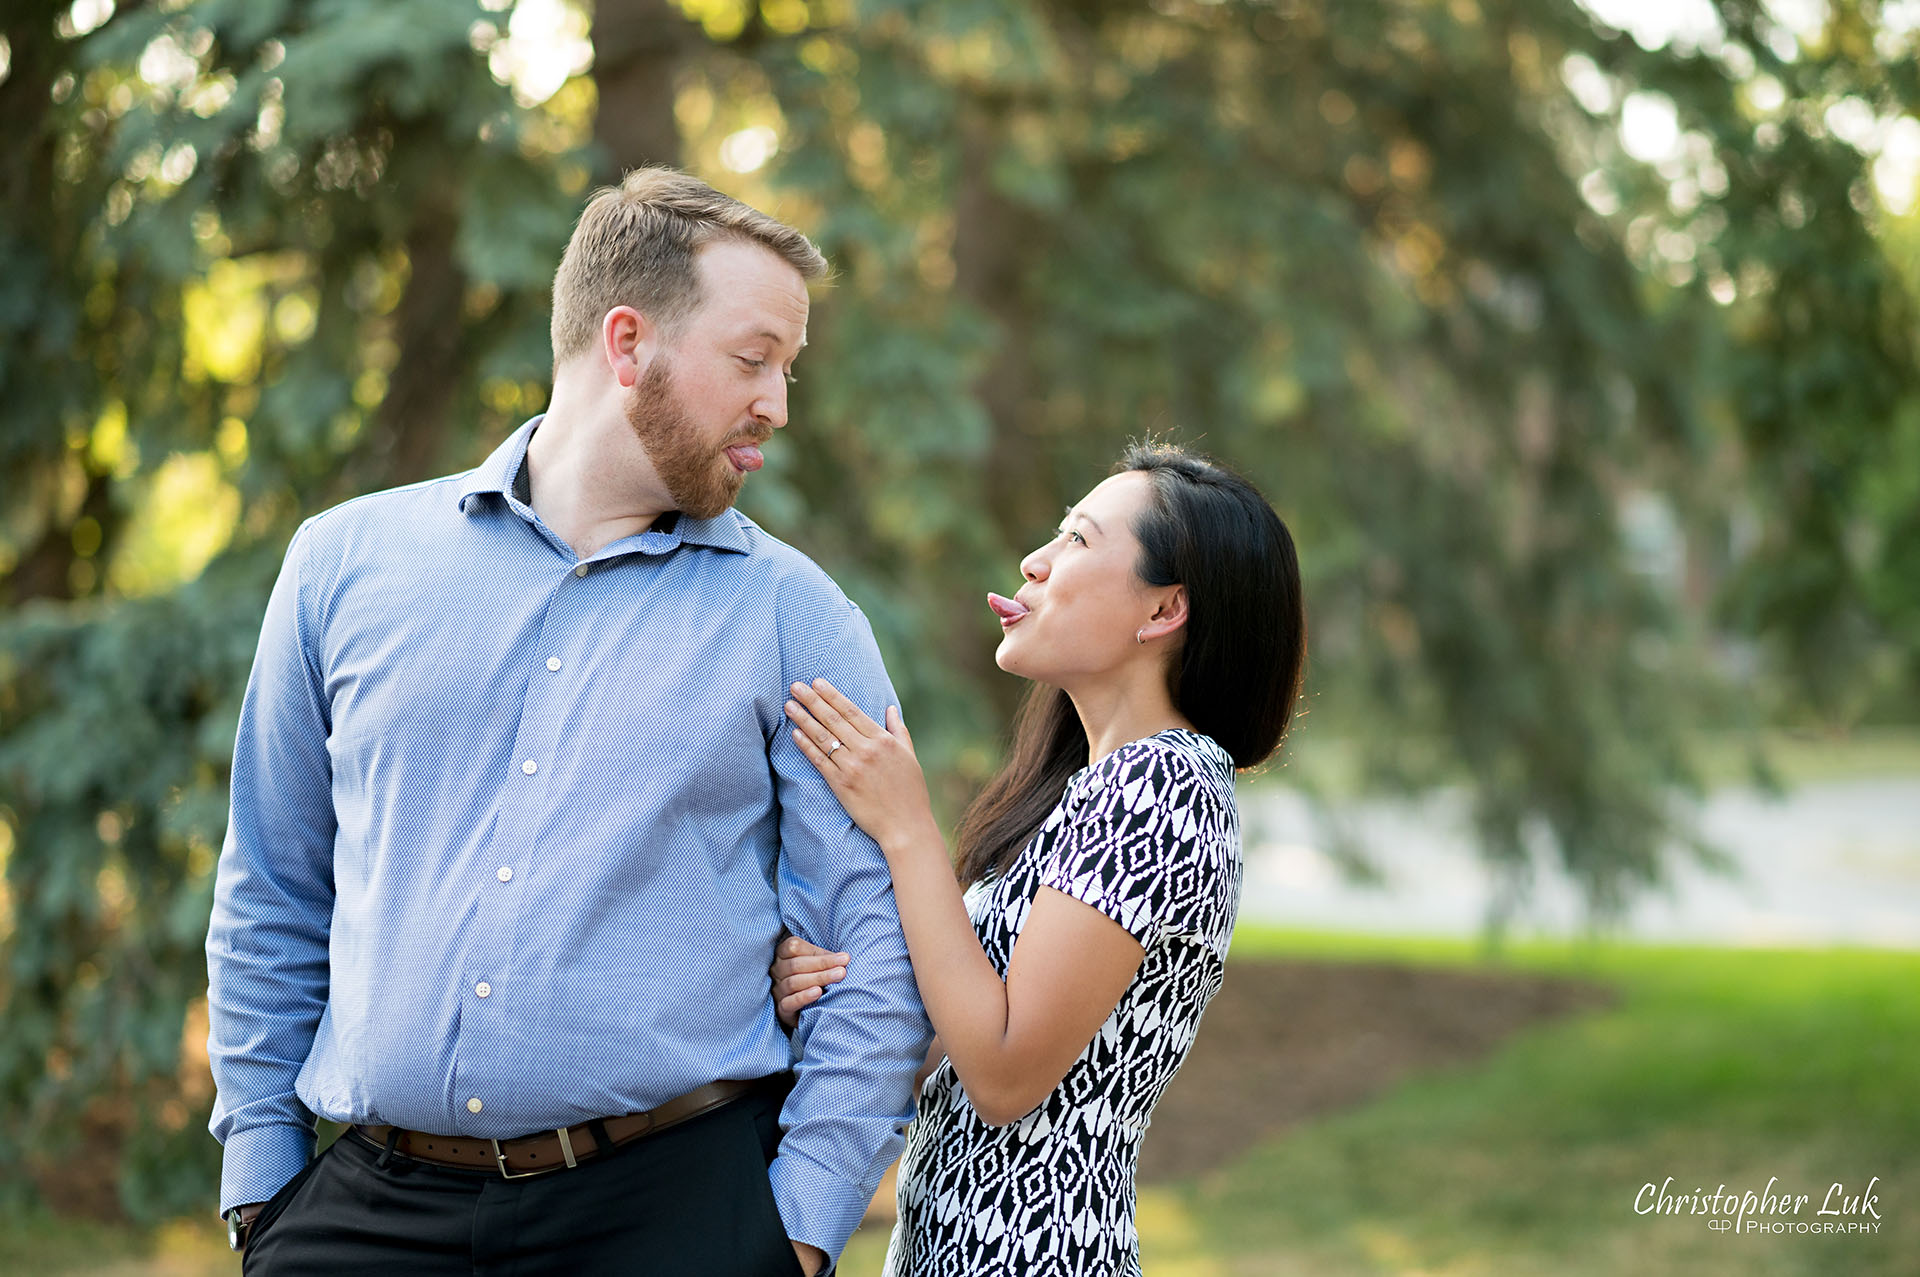 Christopher Luk Photographer Heintzman House Markham Sunset Surprise Wedding Marriage Engagement Proposal She Said Yes Funny Faces Tongue Out